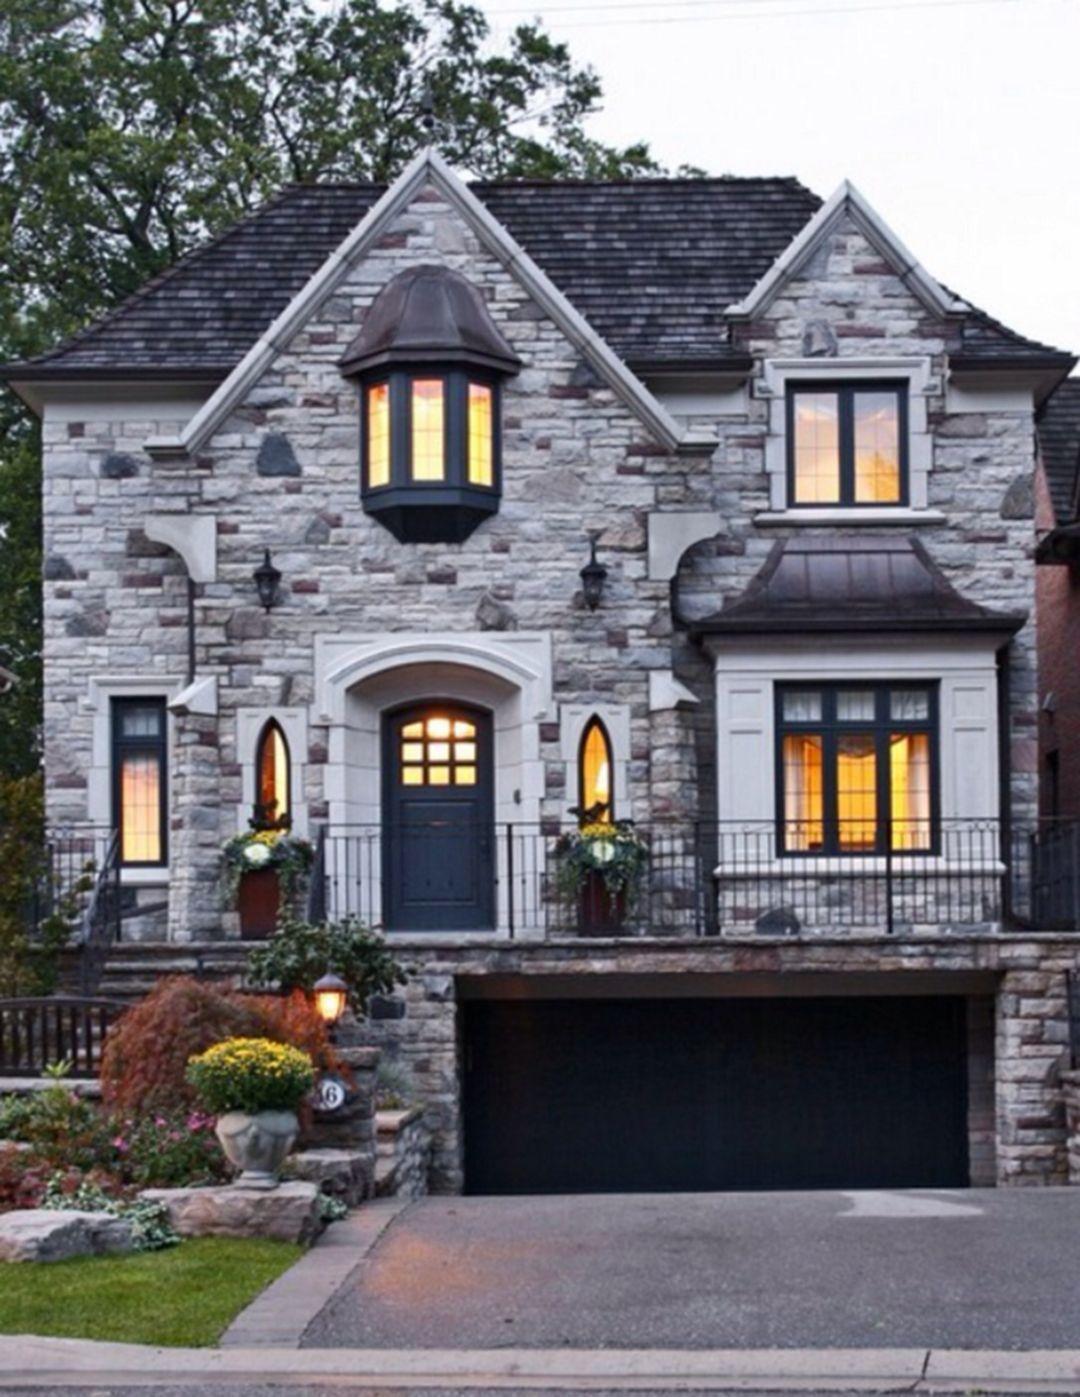 25 Beautiful Stone House Design Ideas On A Budget House Designs Exterior House Exterior Luxury Homes Dream Houses